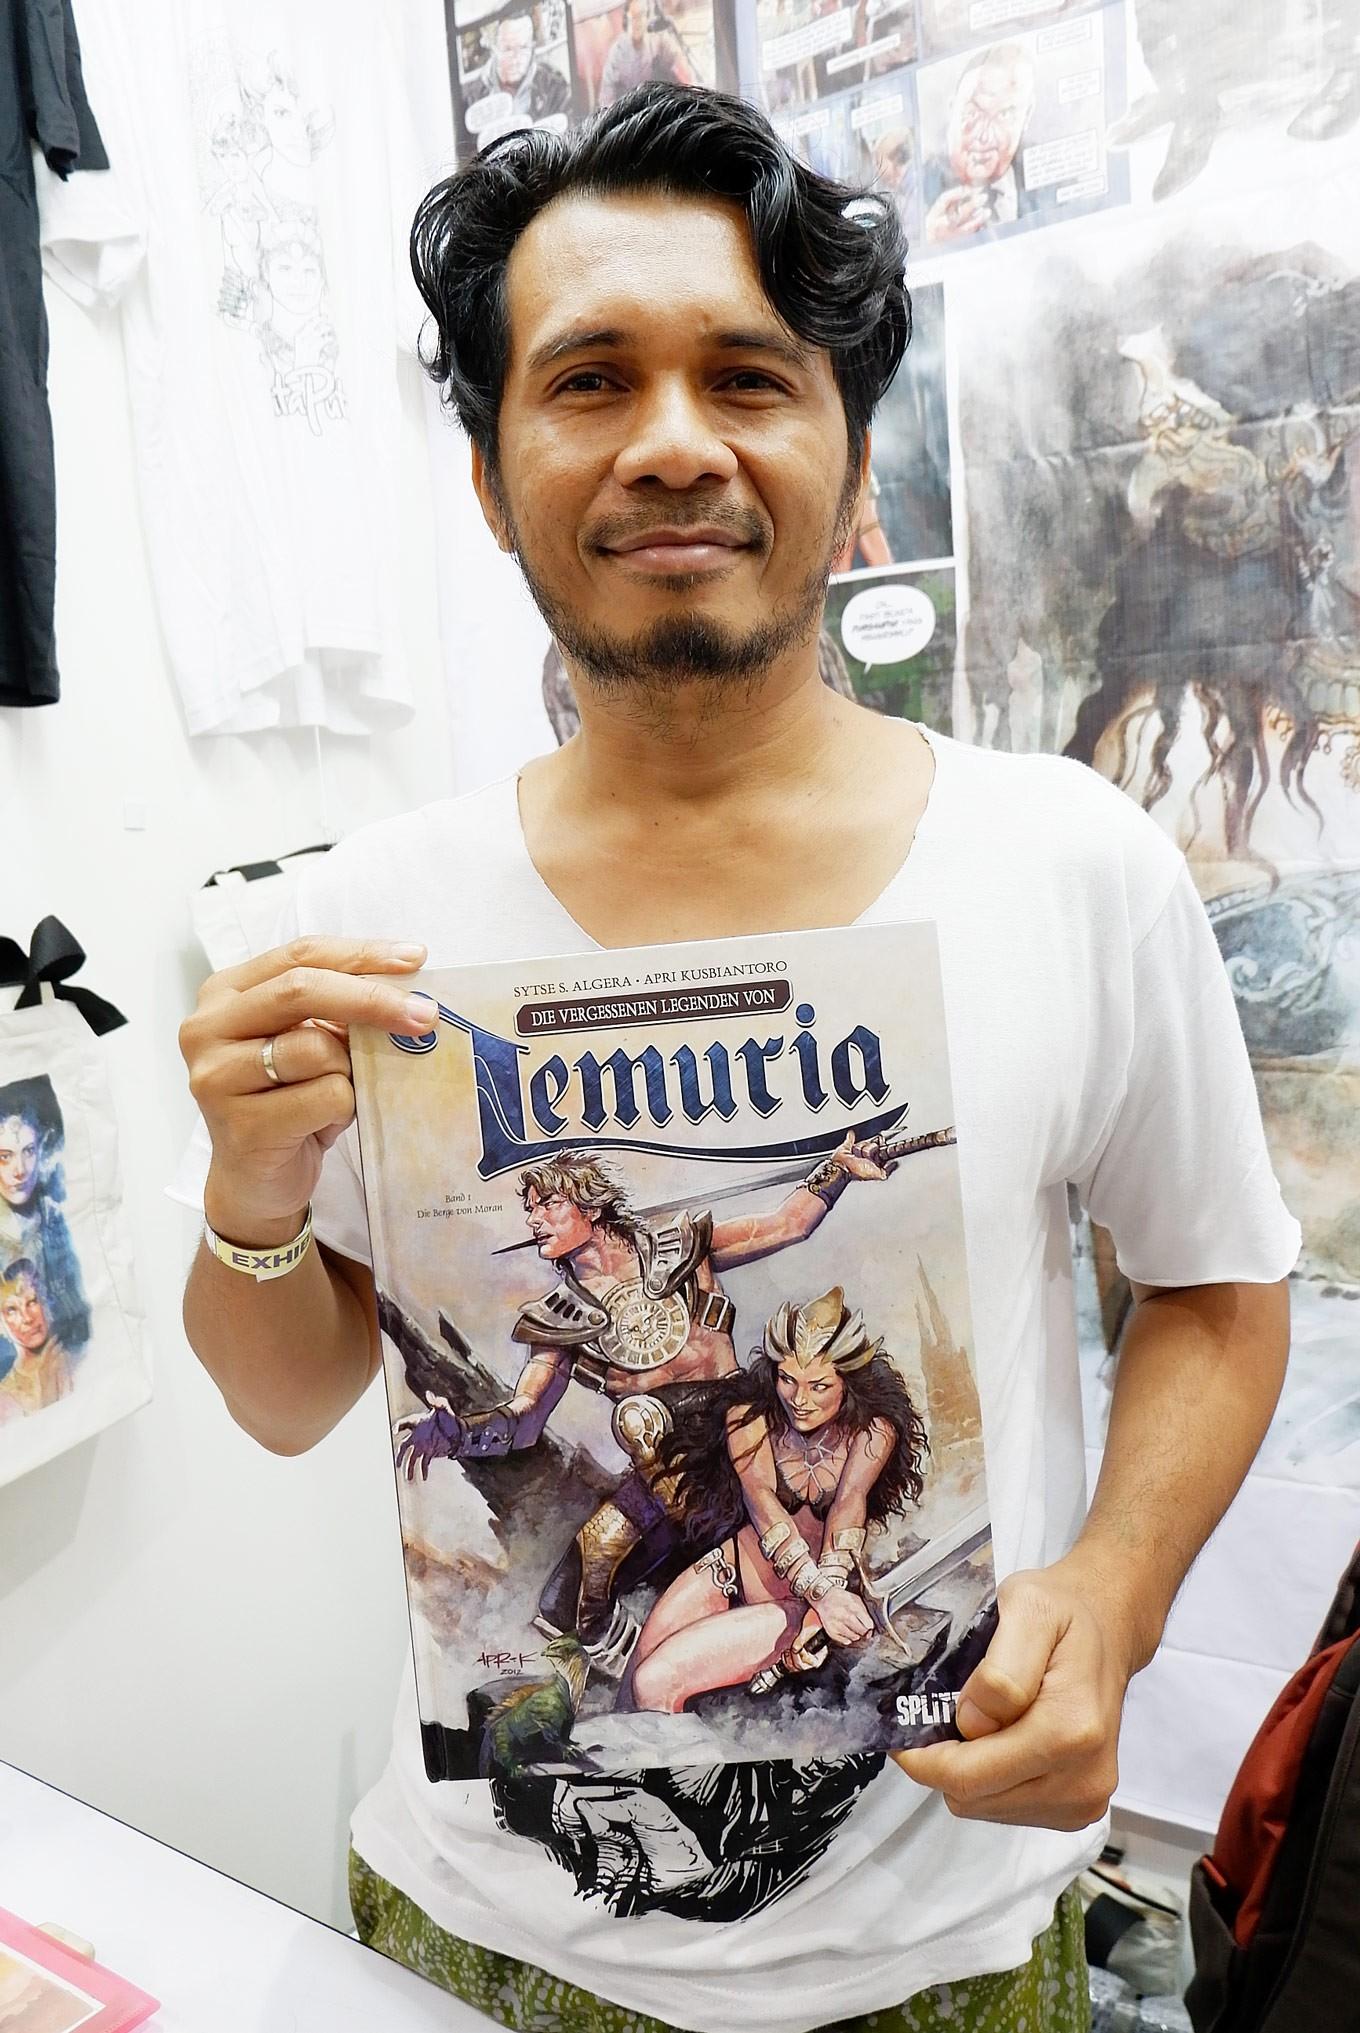 Apri Kusbiantoro: Indonesian successor of Don Lawrence